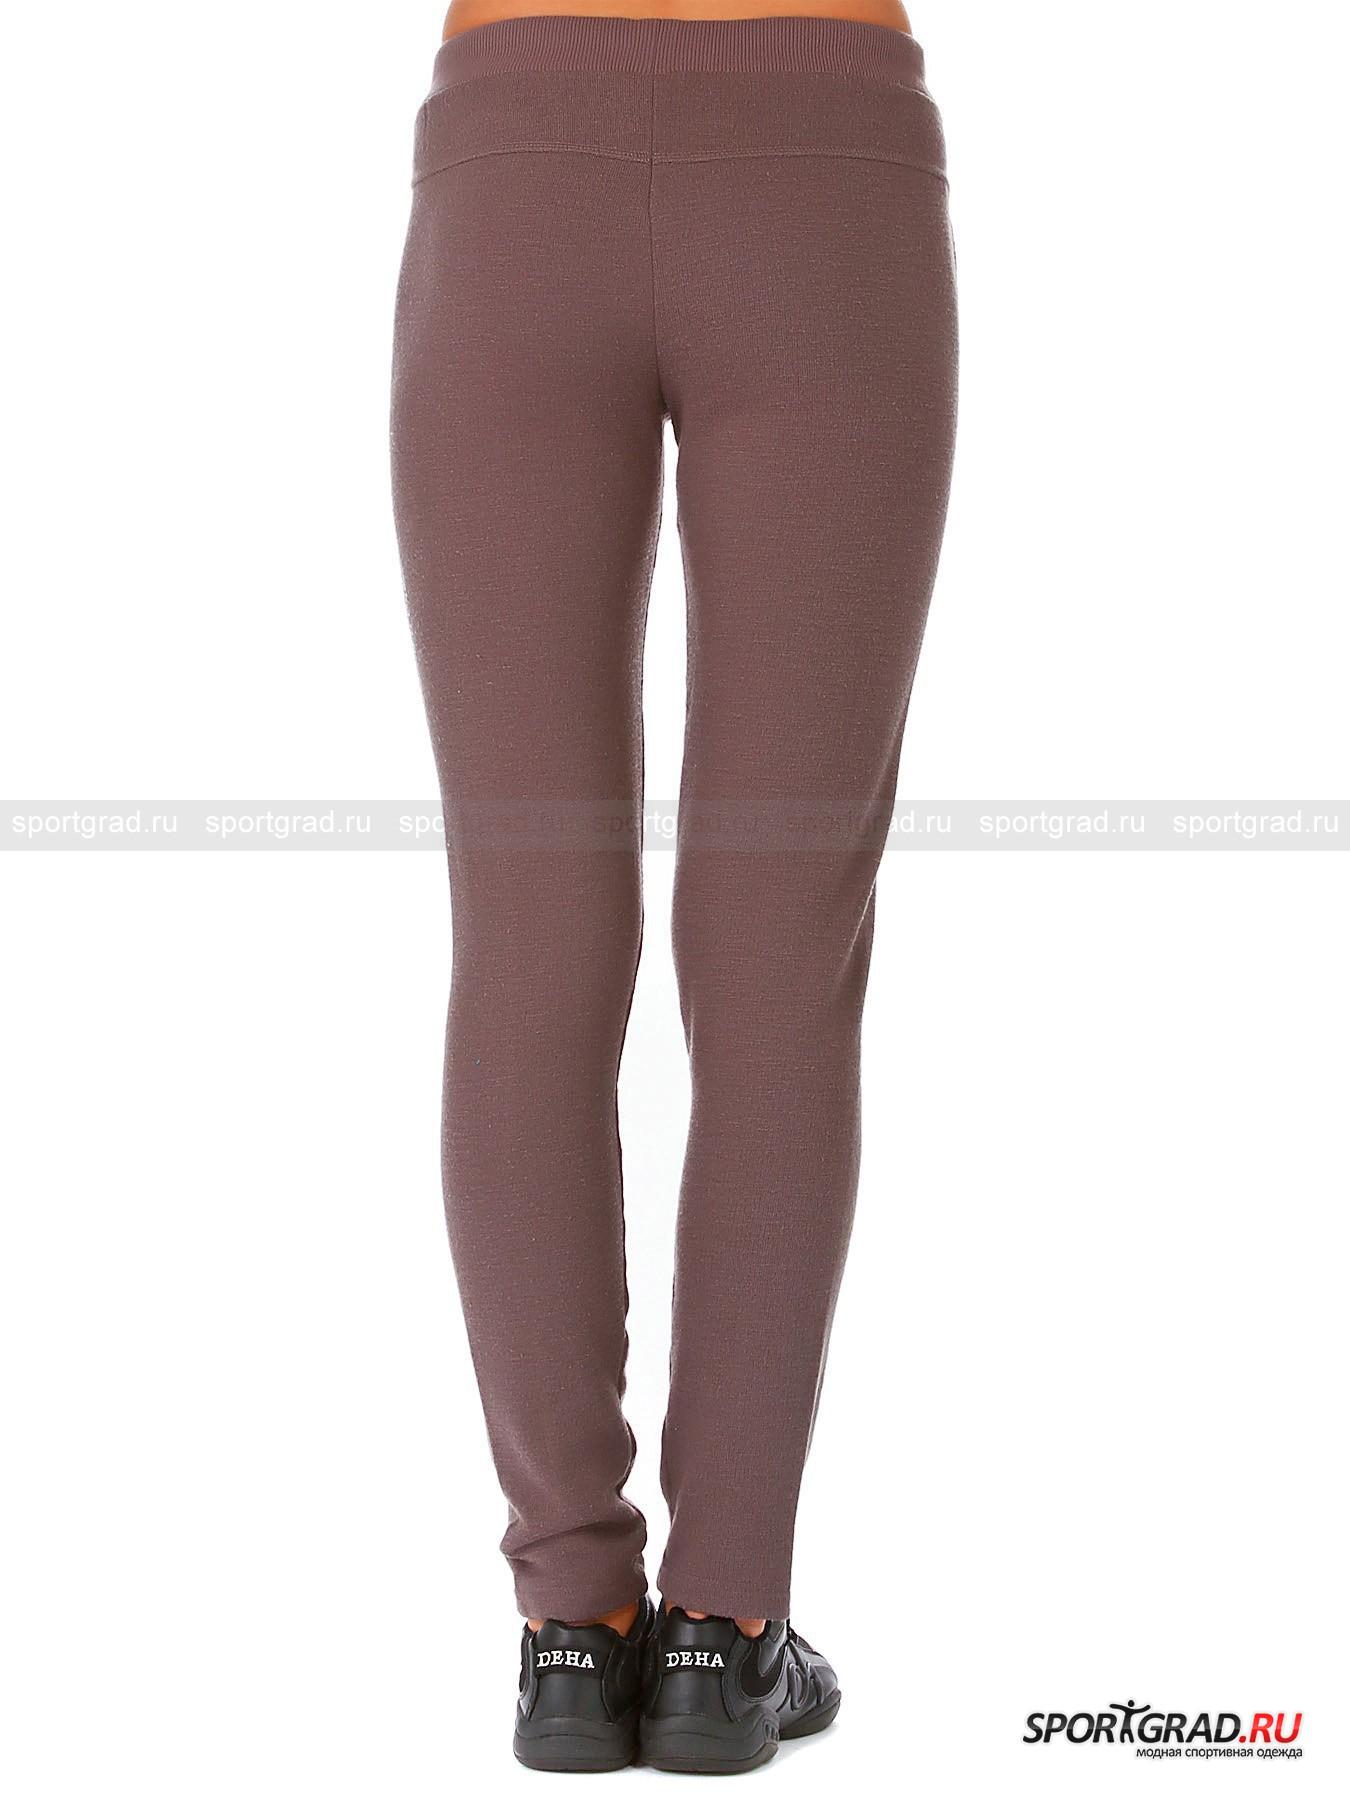 Брюки женские Pants  DEHA с мягким начесом изнутри от Спортград